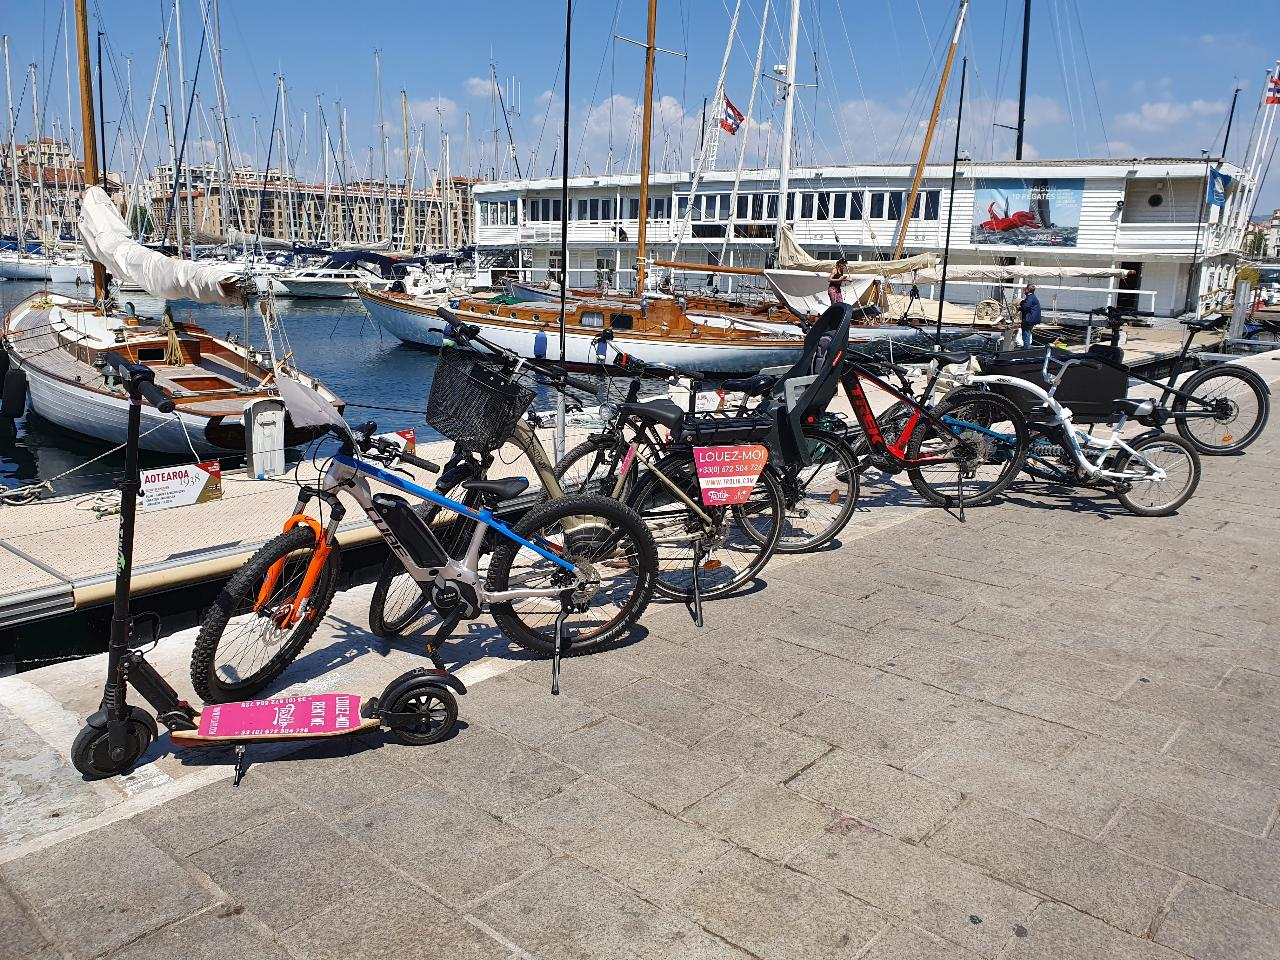 Location demi journee velo, VTT, cargo, trottinette electrique a Marseille